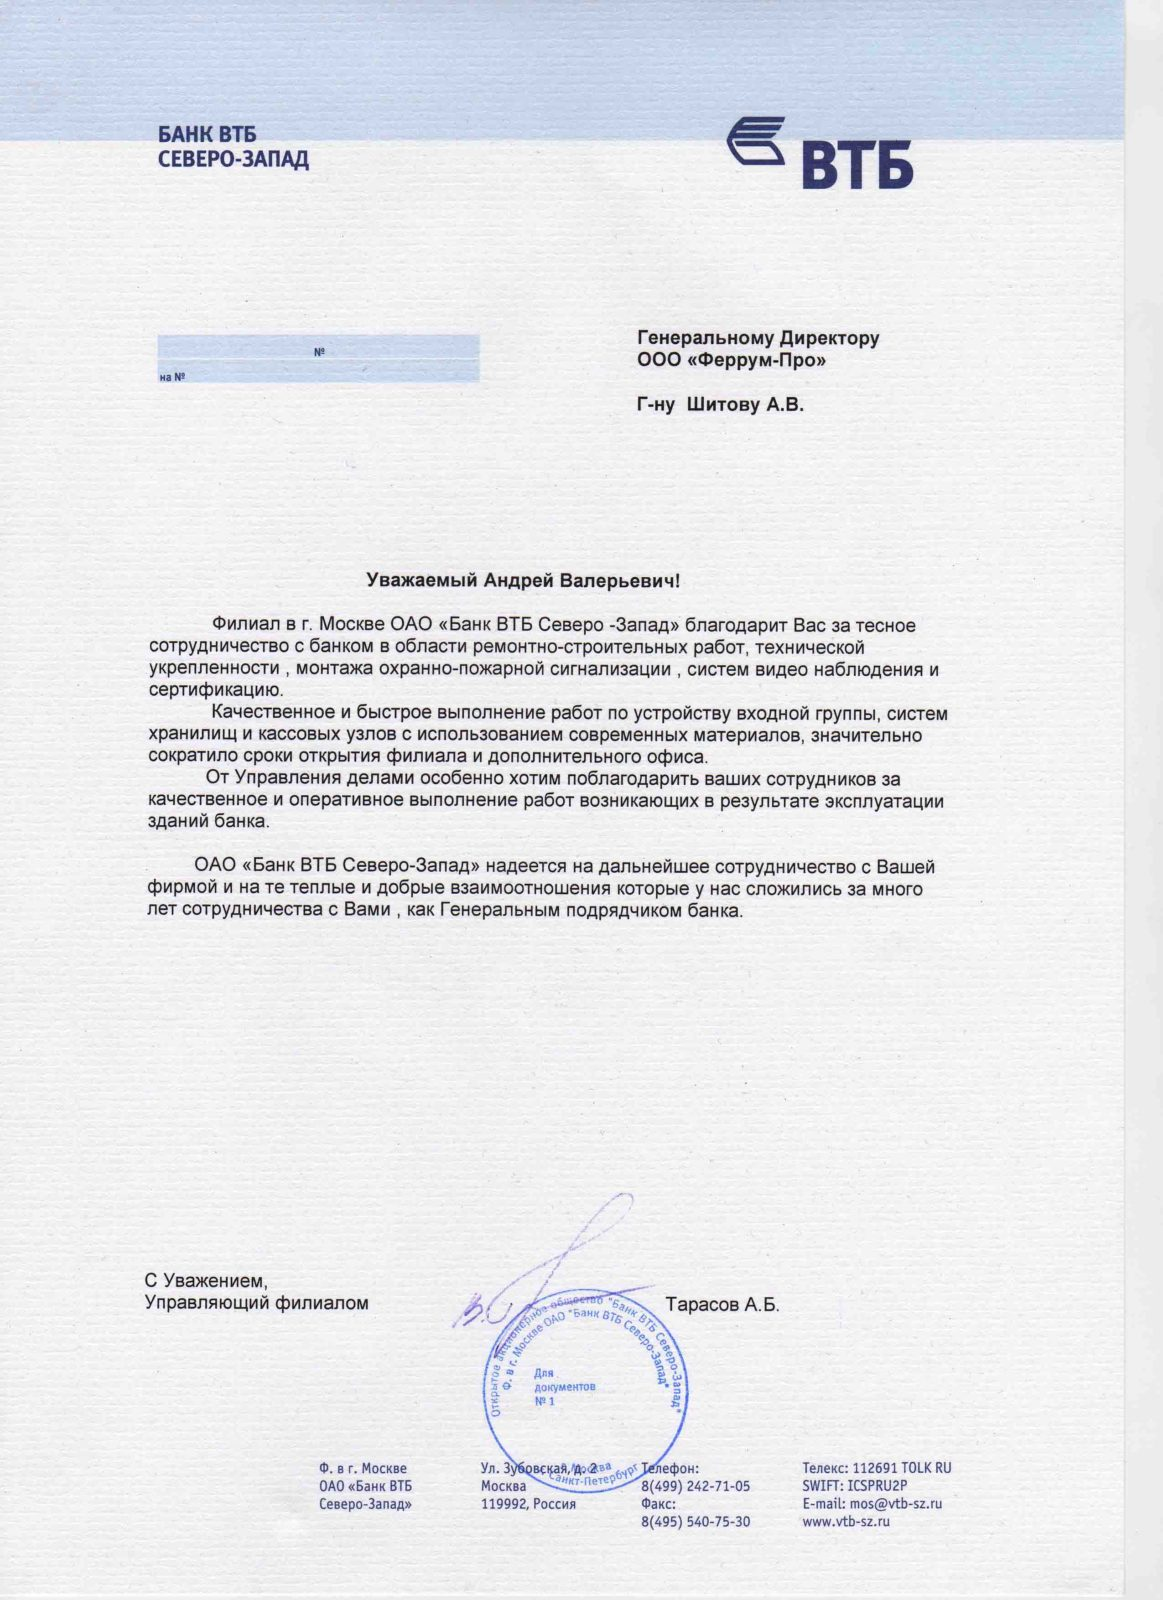 VTB-severo-zapad004